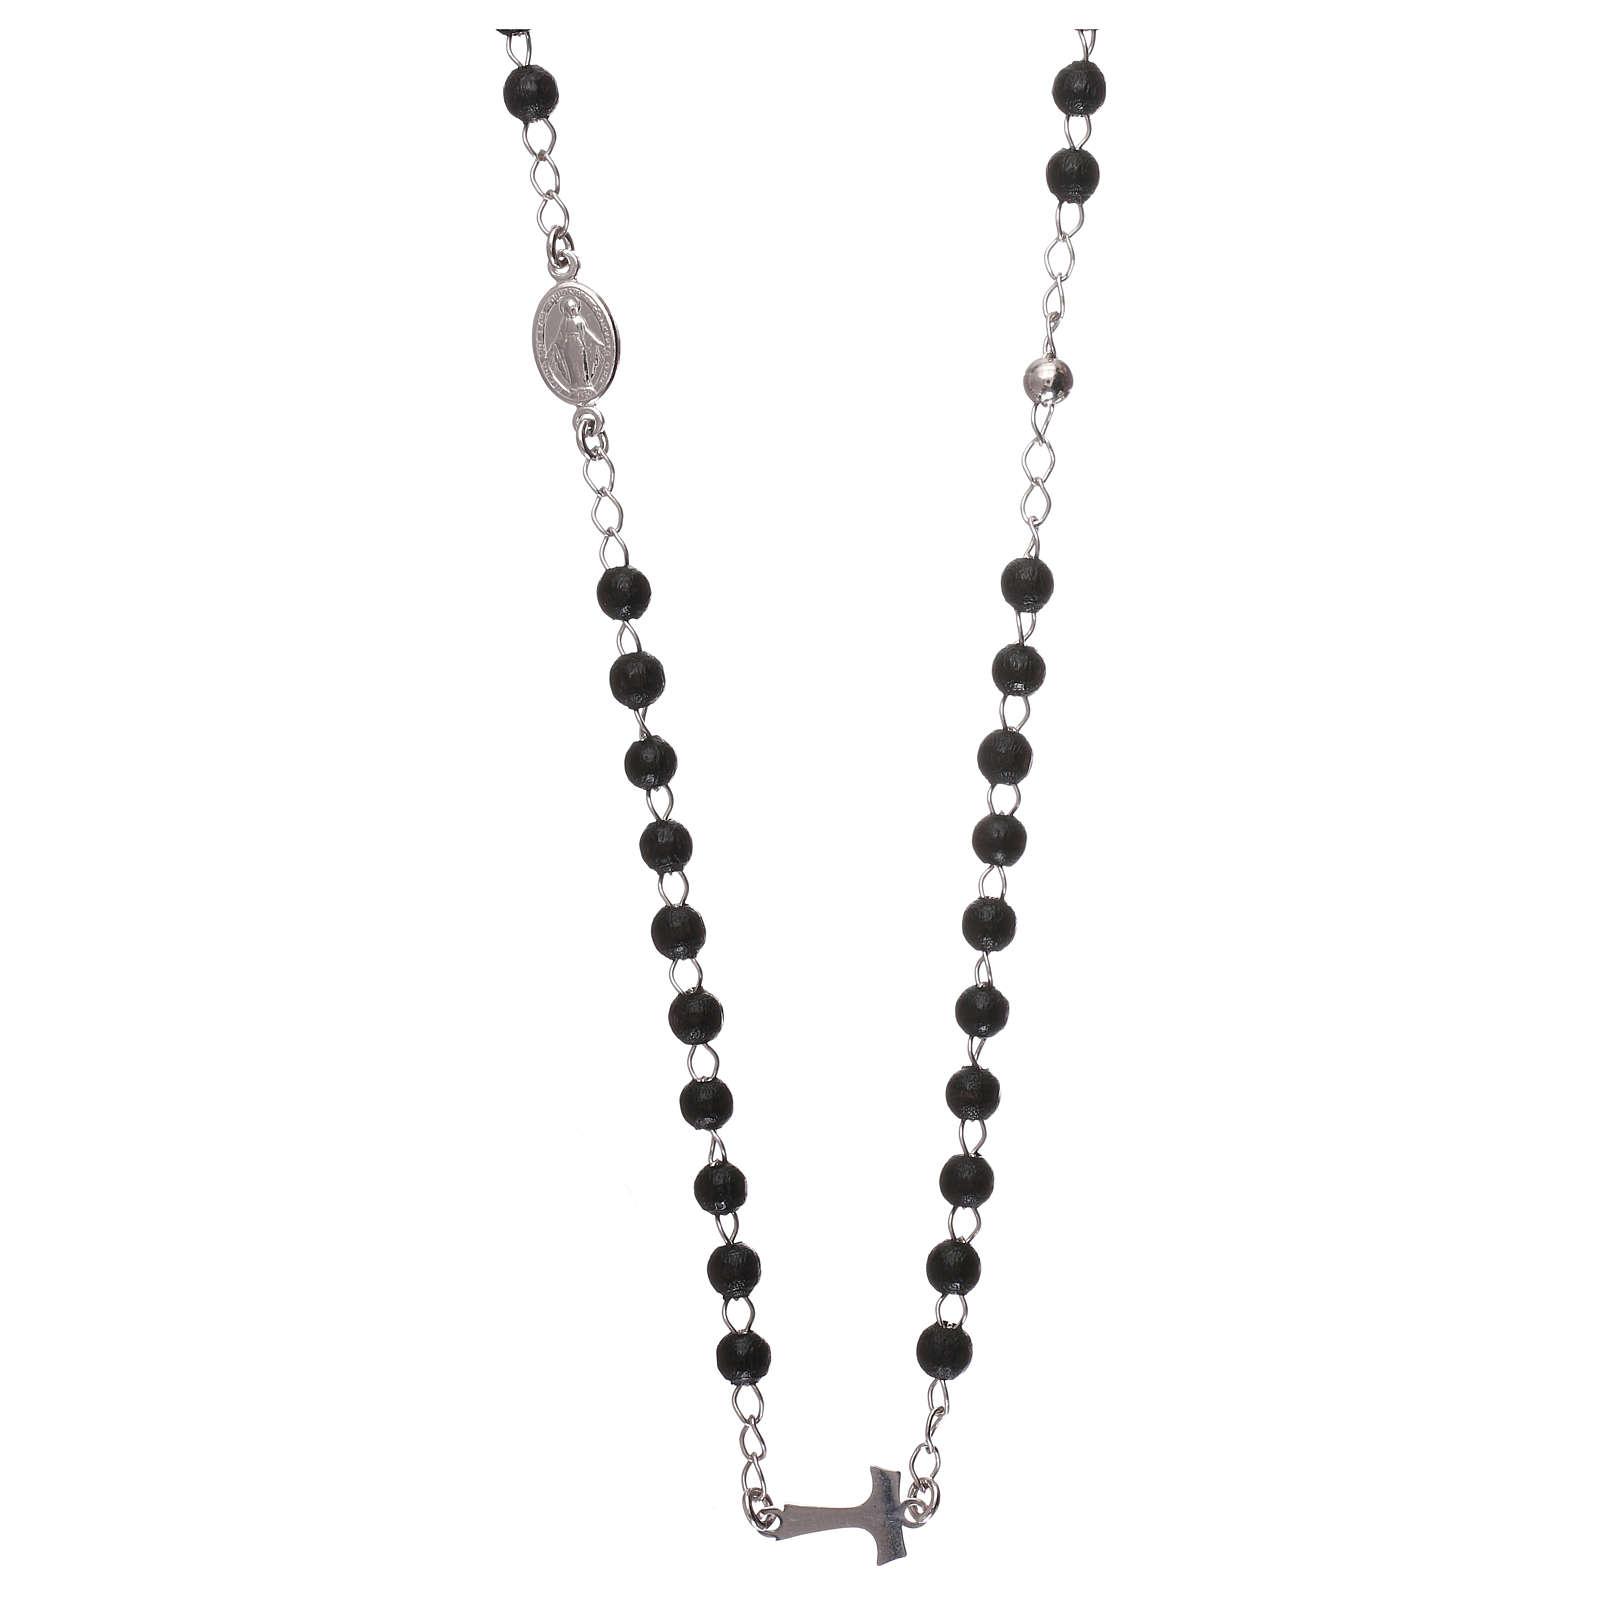 Silver tau rosary collier black wood pearls AMEN 4